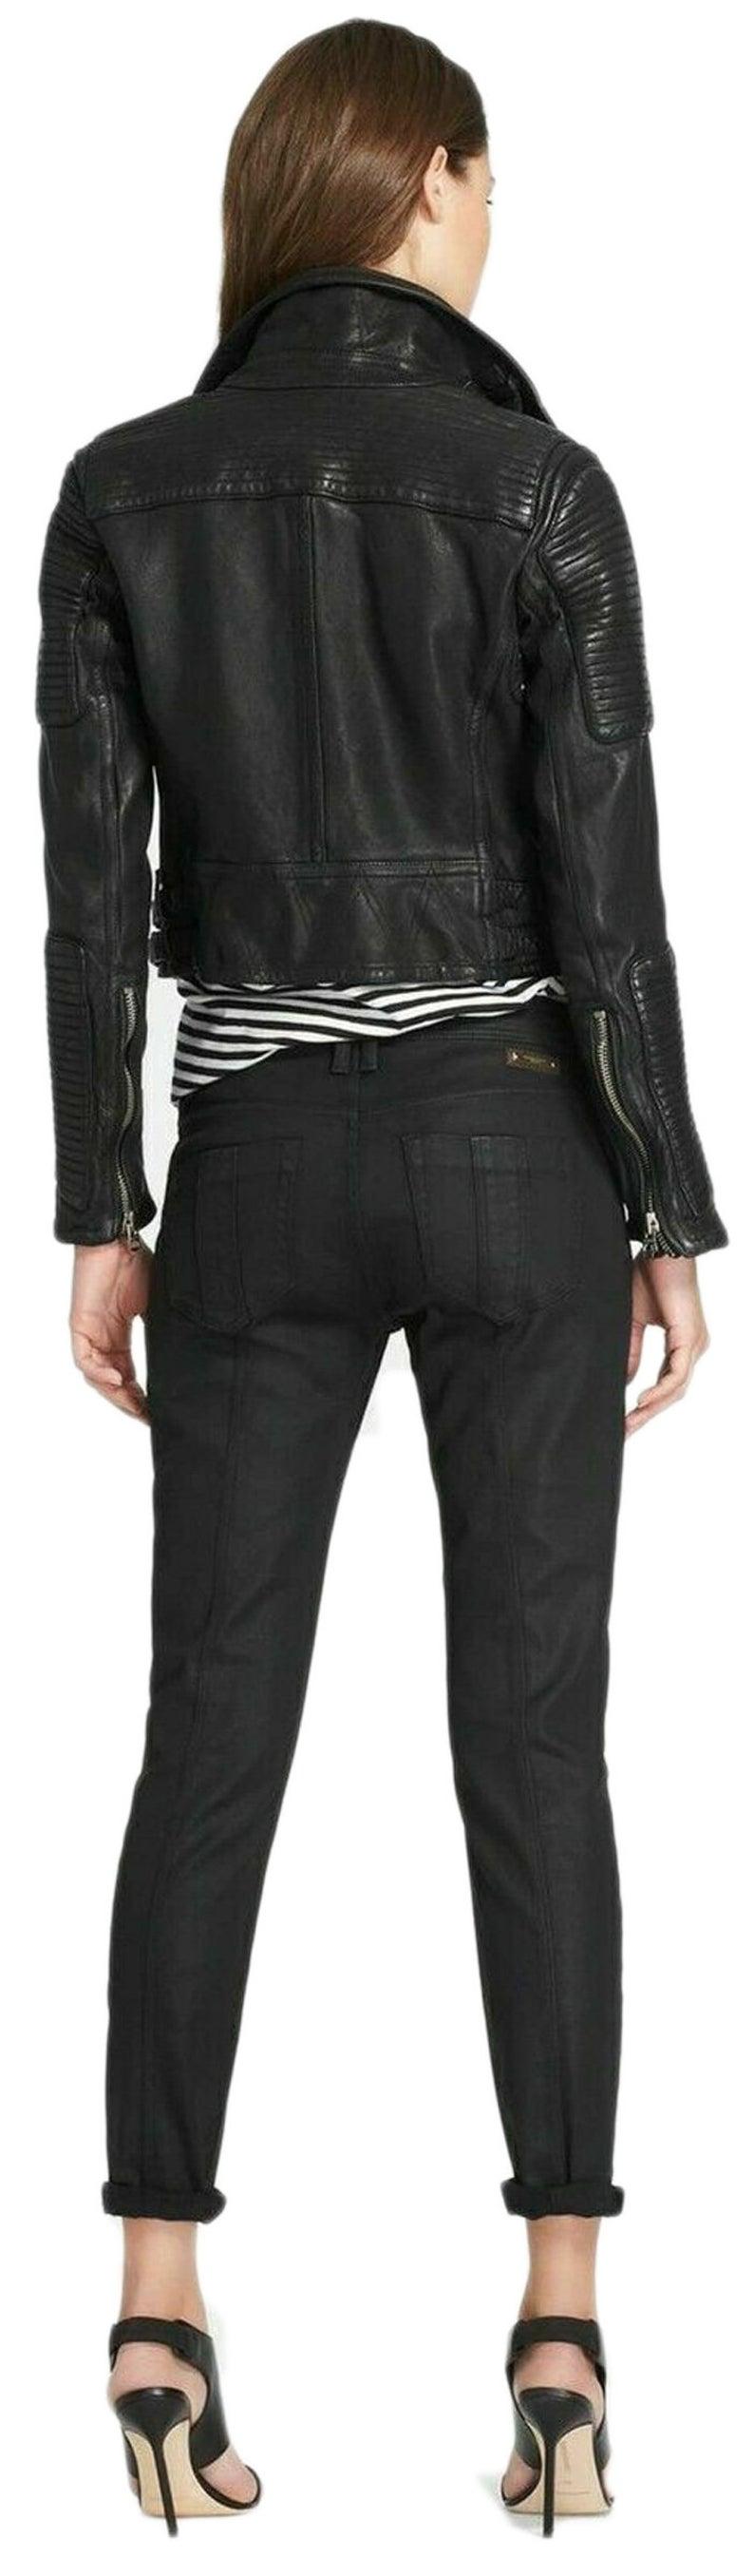 Women S Genuine Lambskin Leather Jacket Handmade Jacket Black Leather Jacket Motorcycle Slim Fit Racer Jacket Custom Made In 2021 Lambskin Leather Jacket Womens Quilted Jacket Leather Jackets Women [ 2711 x 794 Pixel ]